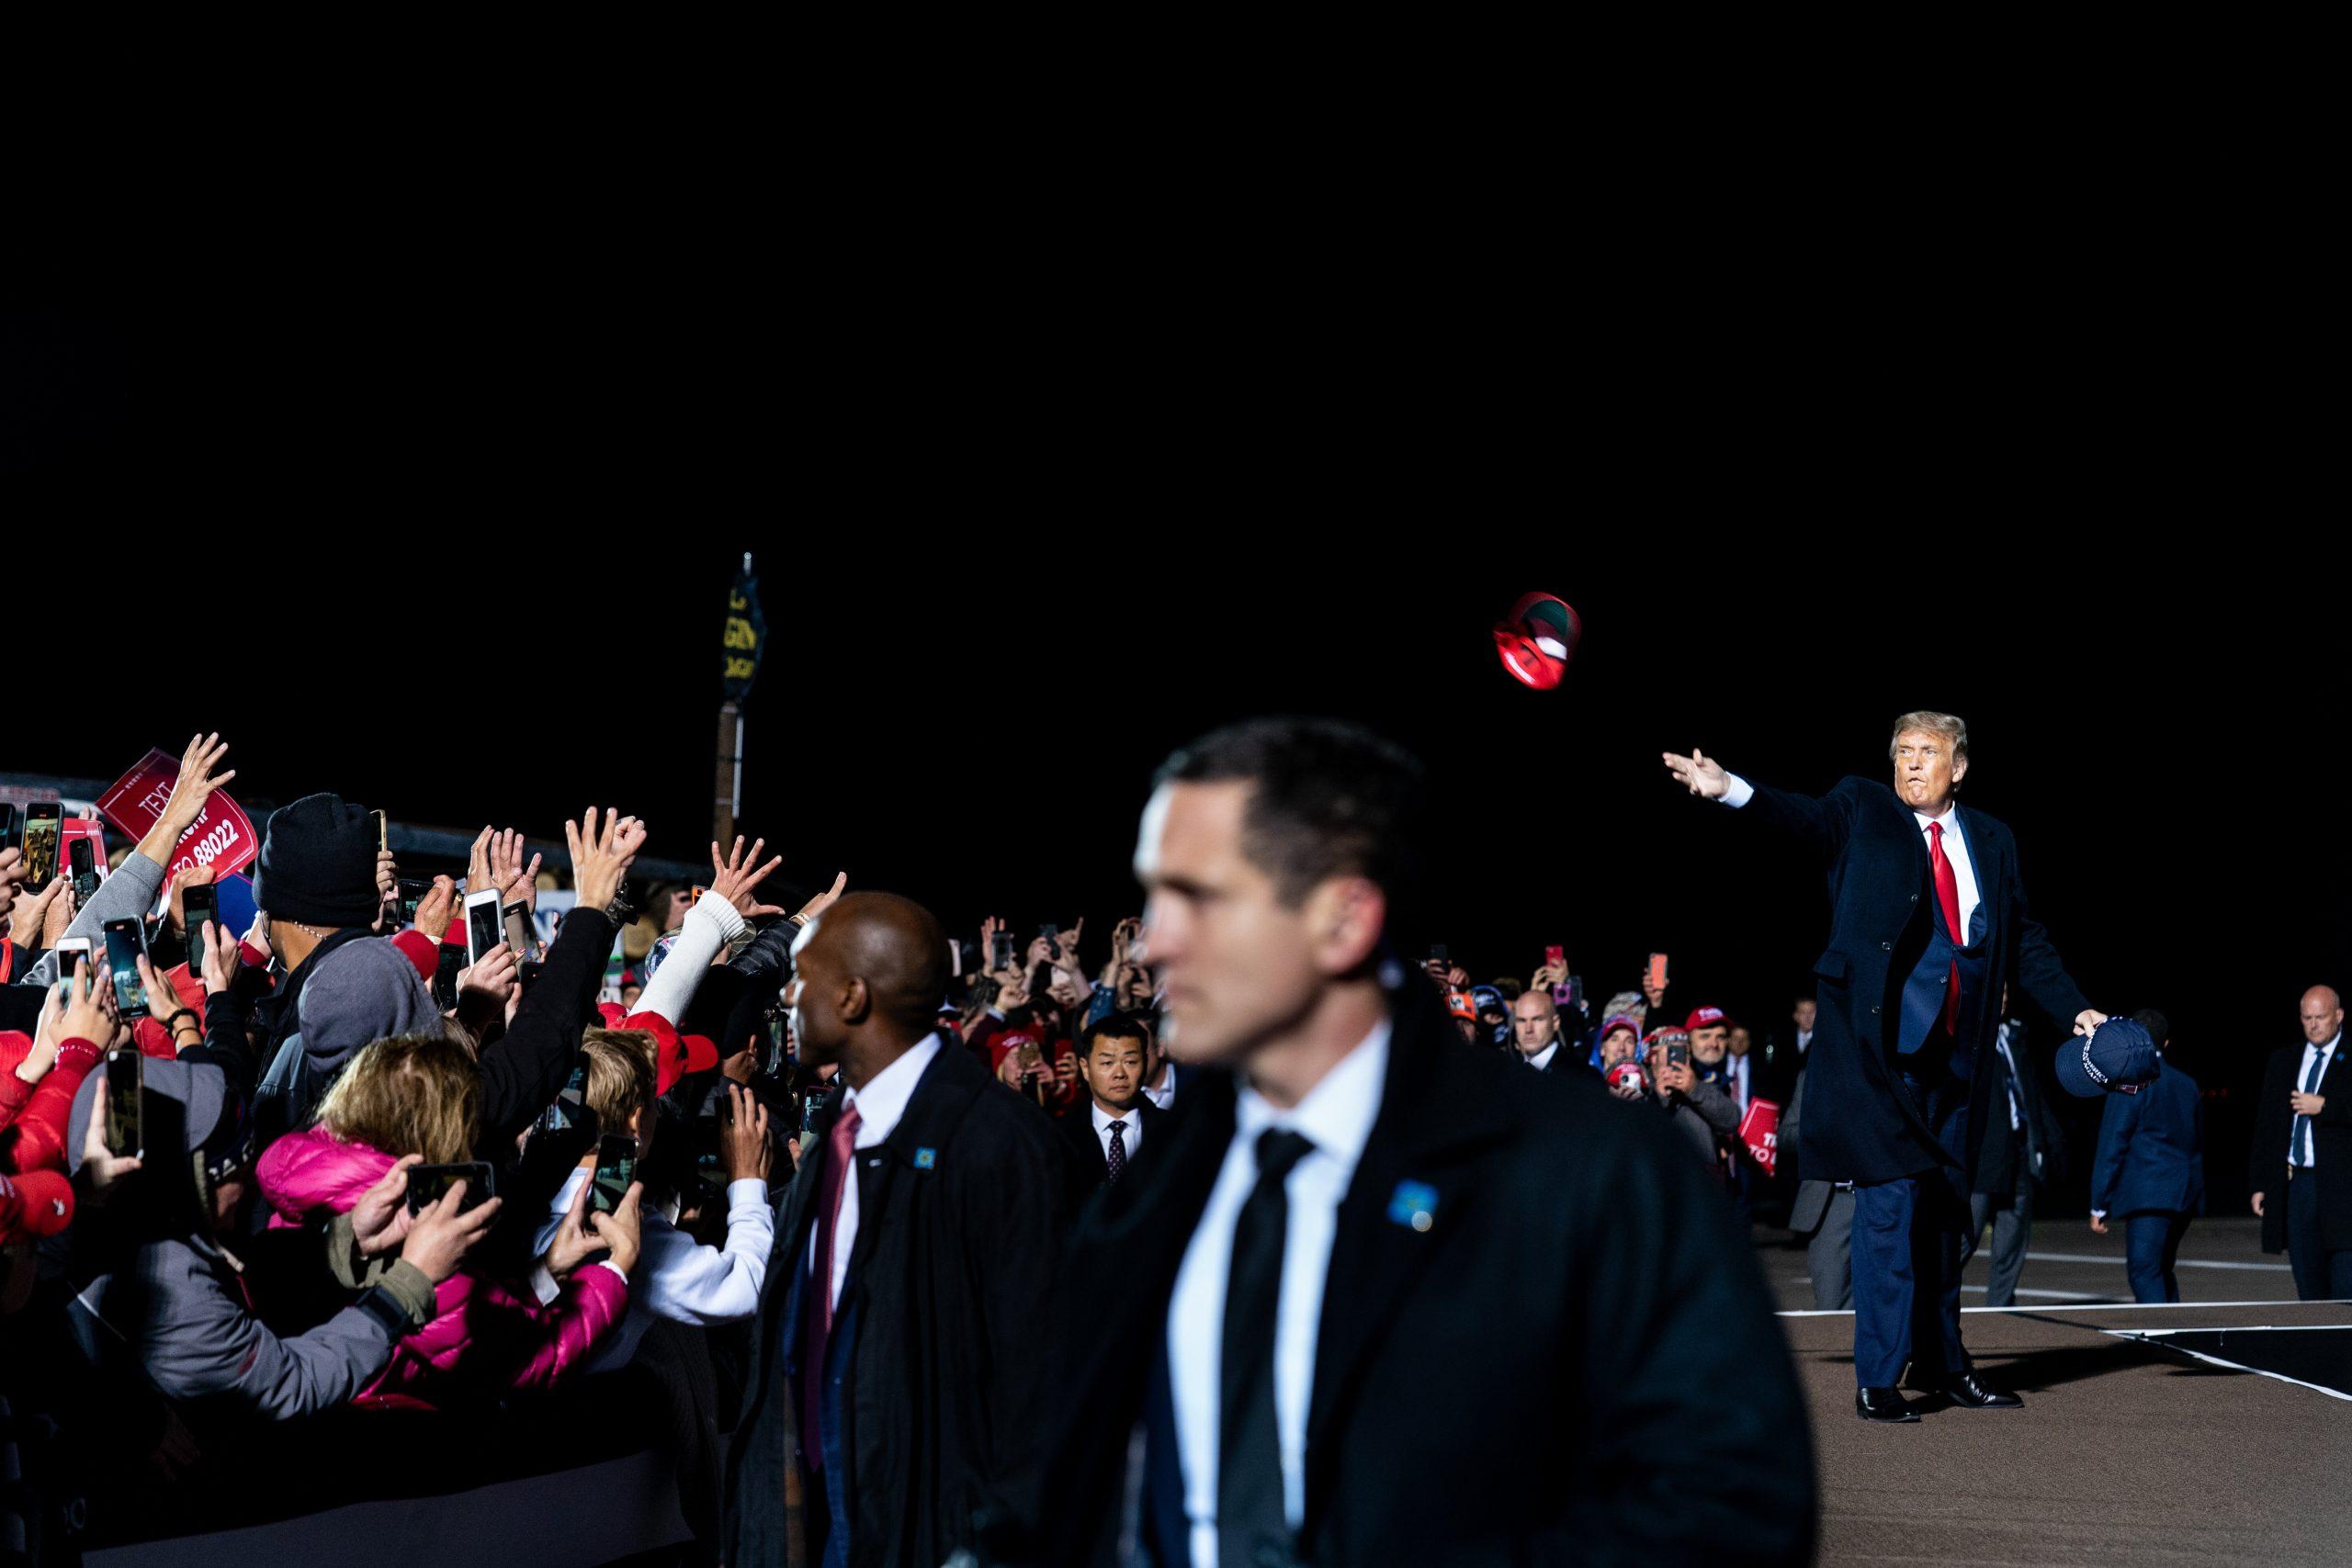 https://anysizedealsweek.com/wp-content/uploads/2020/10/Trump-scaled.jpg